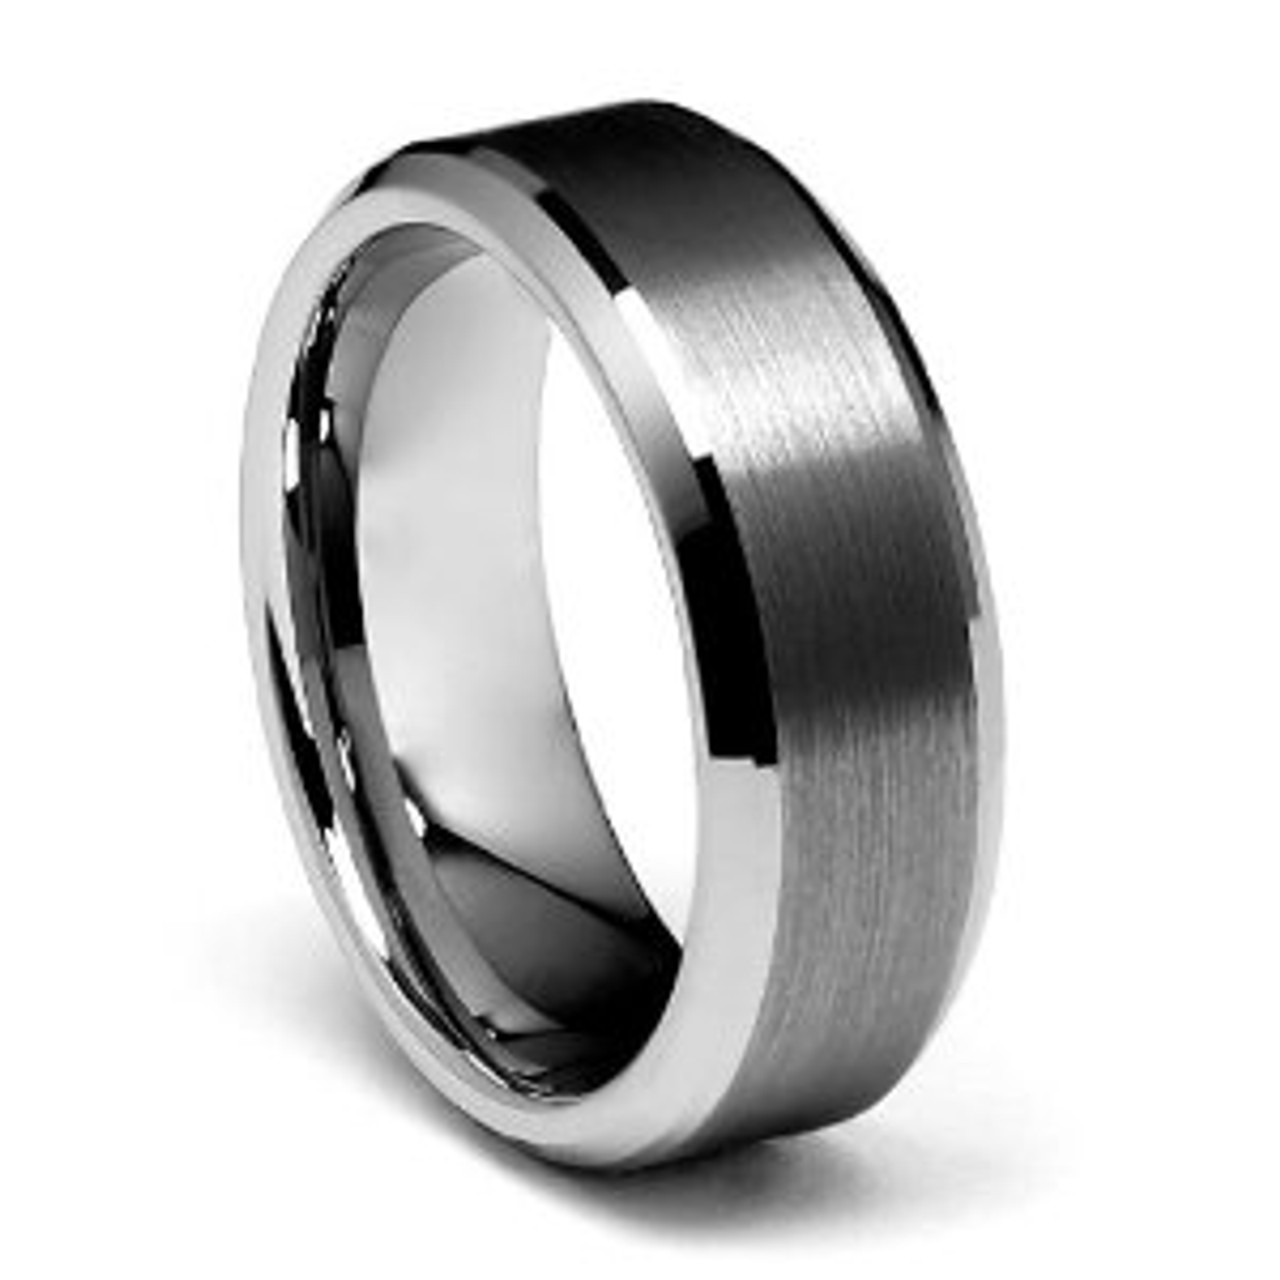 Beveled Edge Tungsten Wedding Band Free Engraving Forevergifts Com